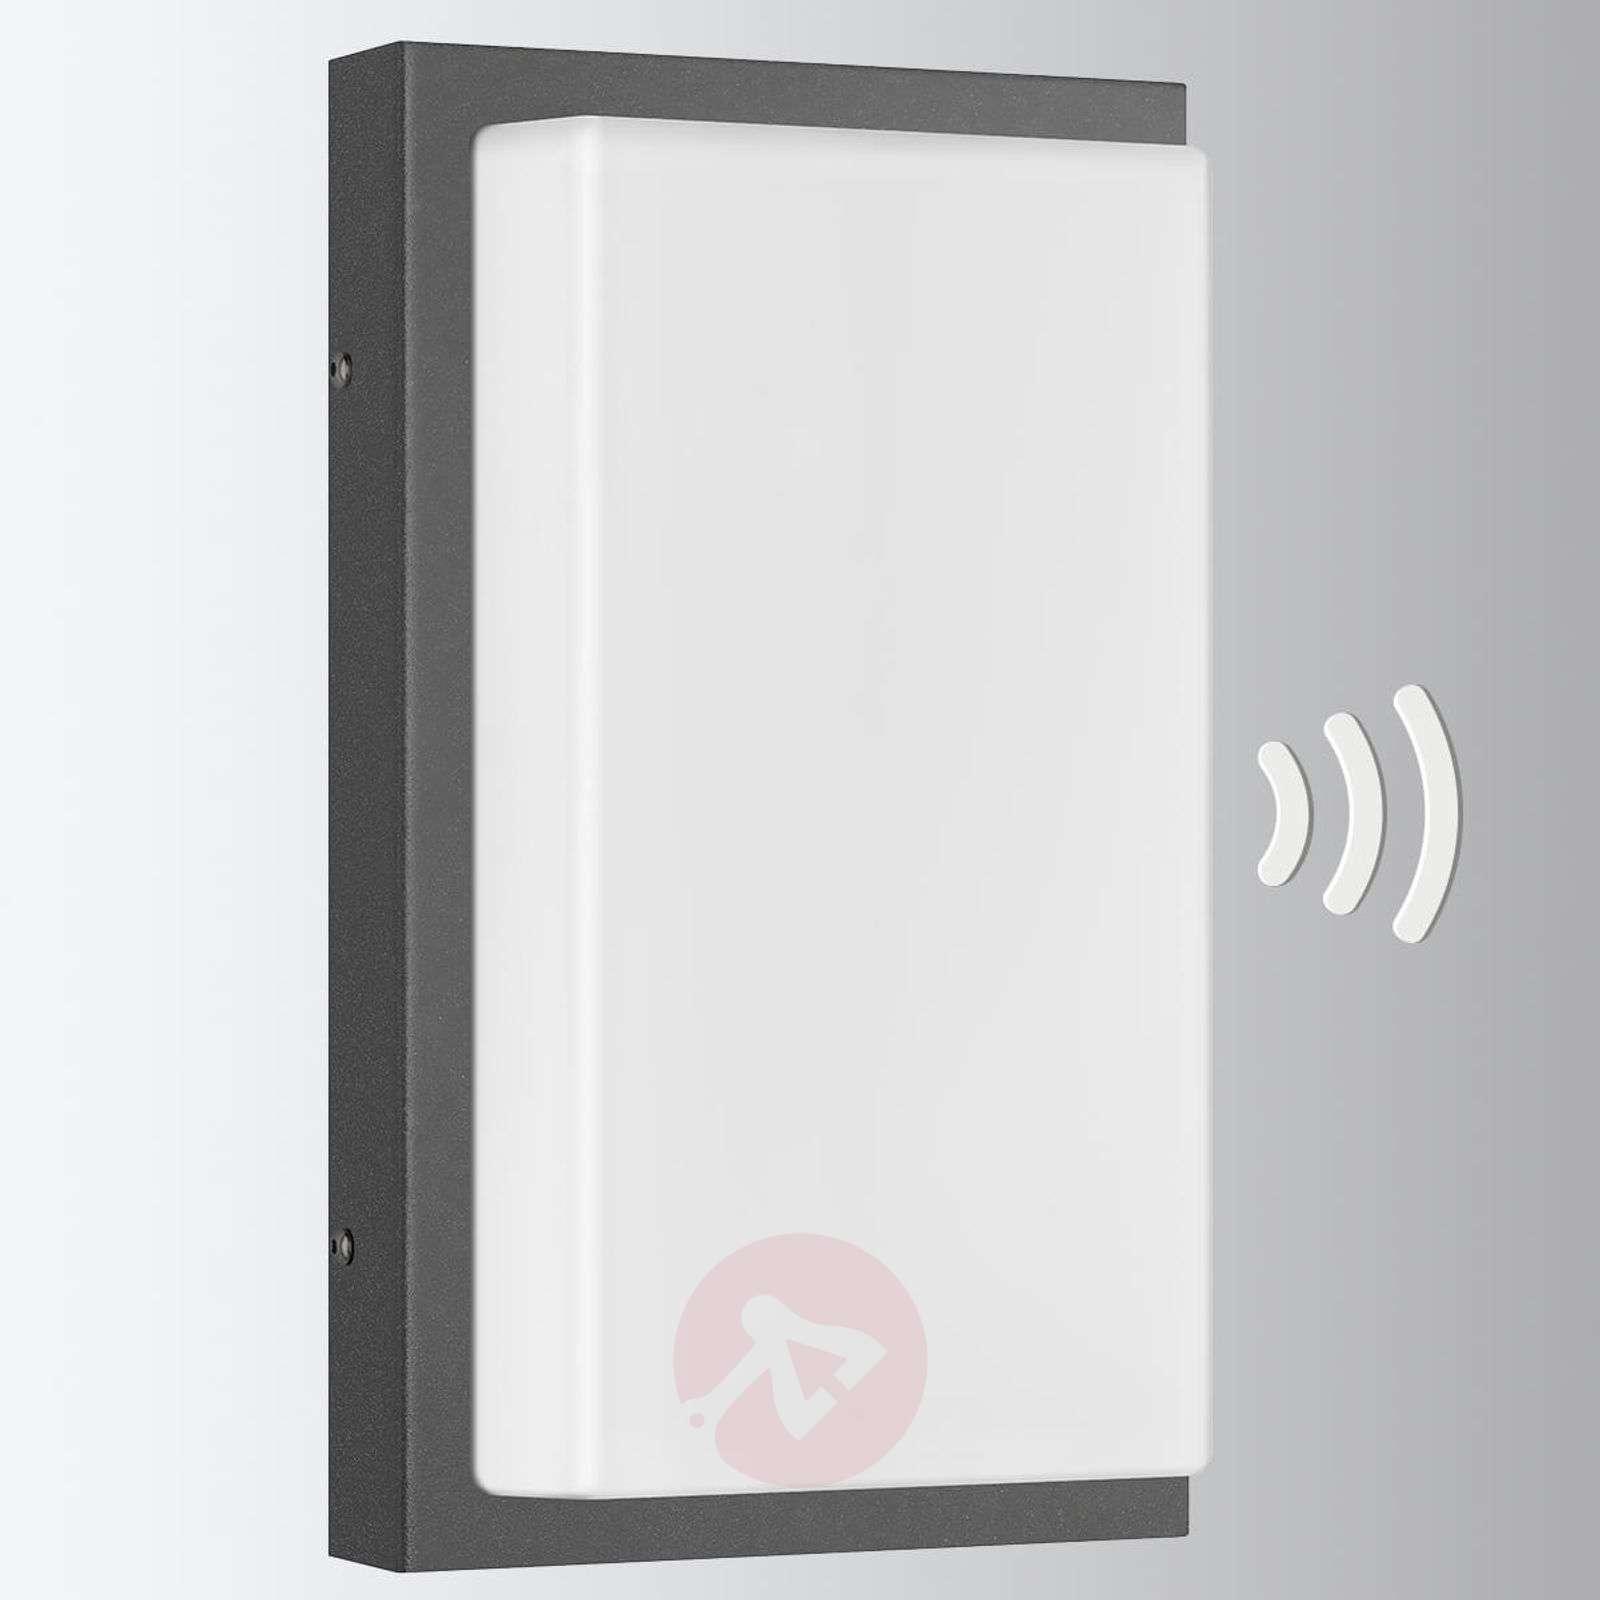 Babett sensor outdoor wall light with LED light-6068120-01